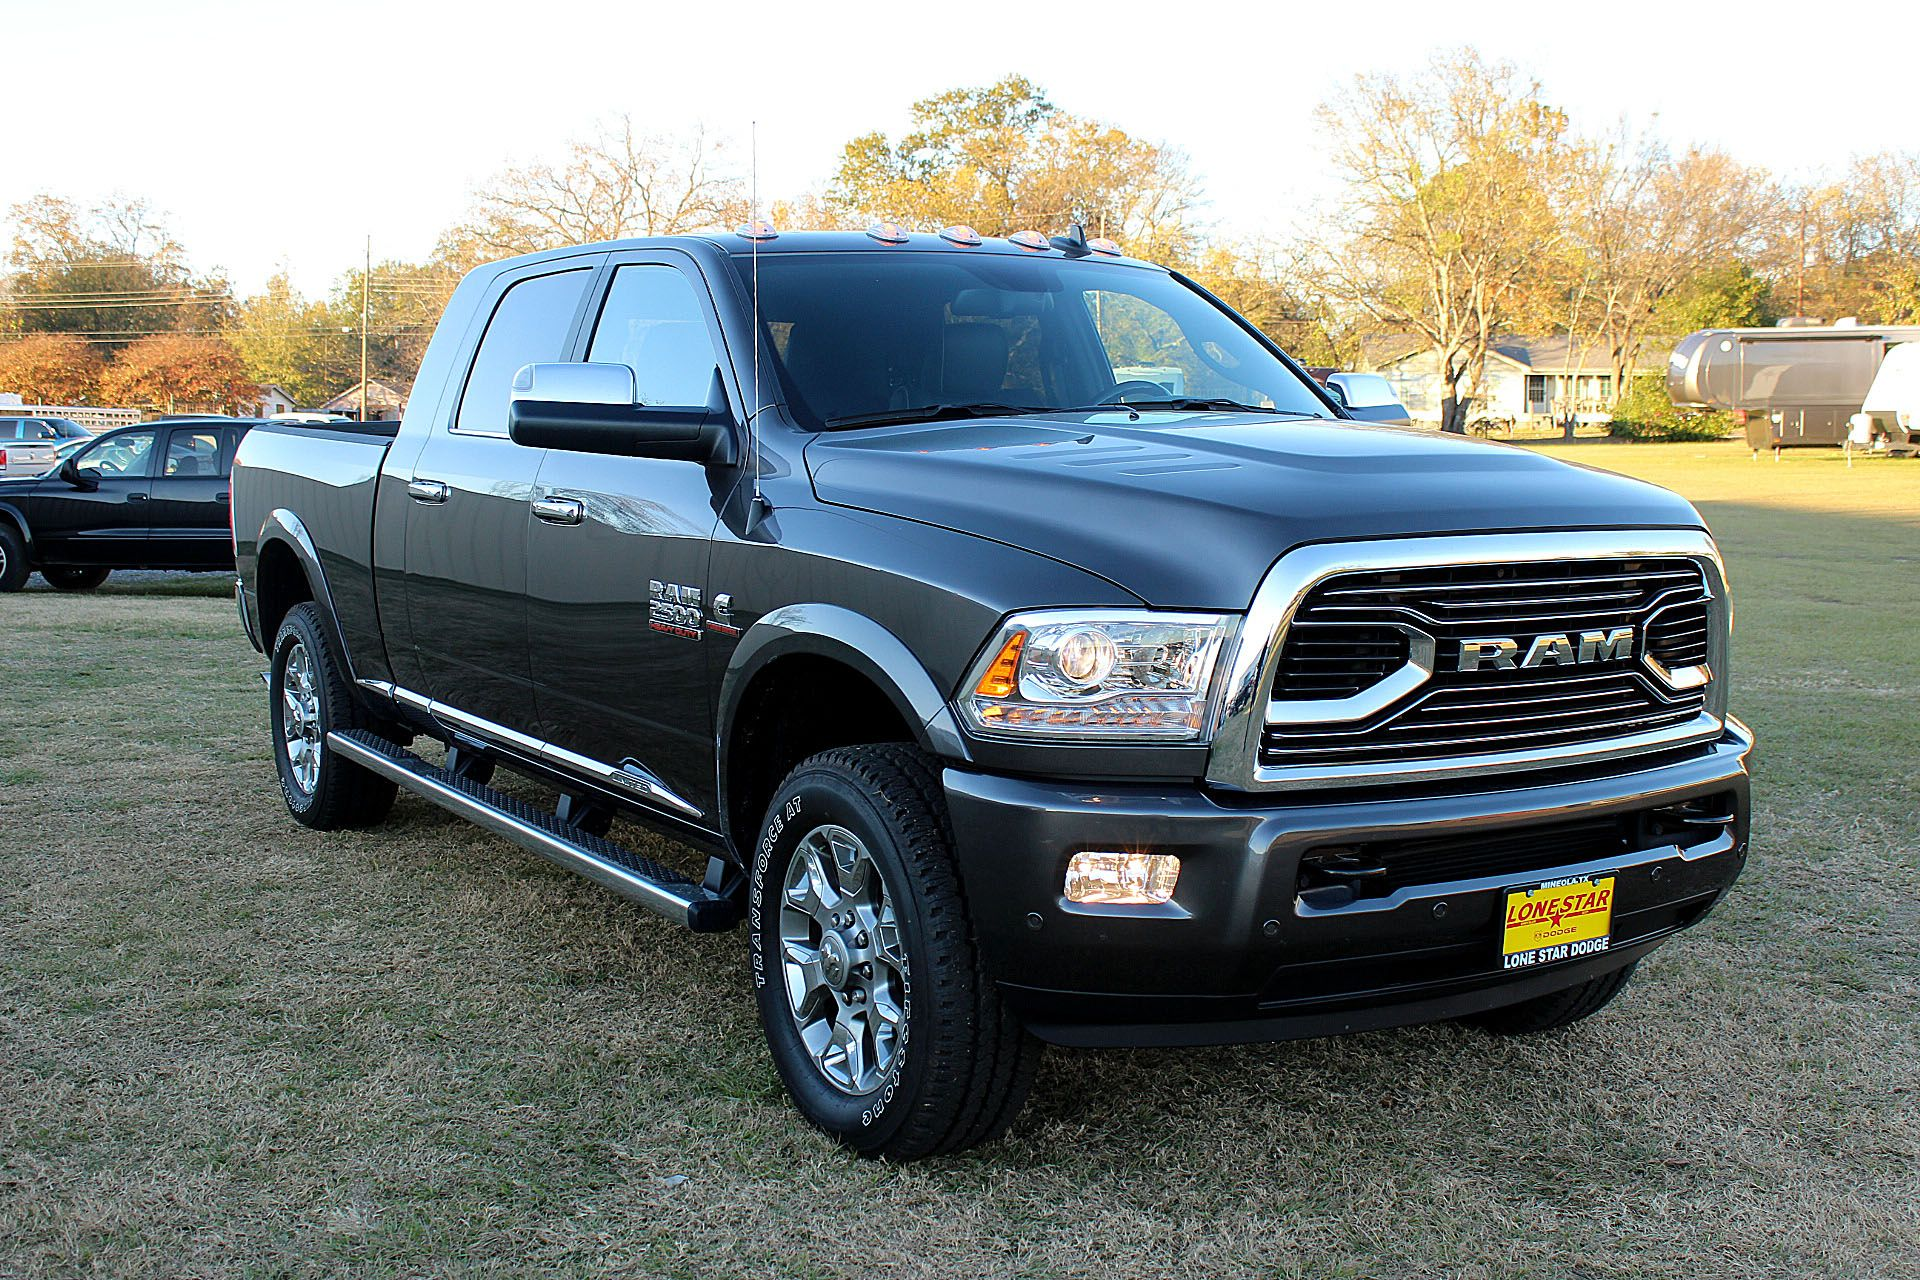 2017 Dodge Ram 2500 Limited Dodge Trucks Ram Dodge Ram Ram Trucks